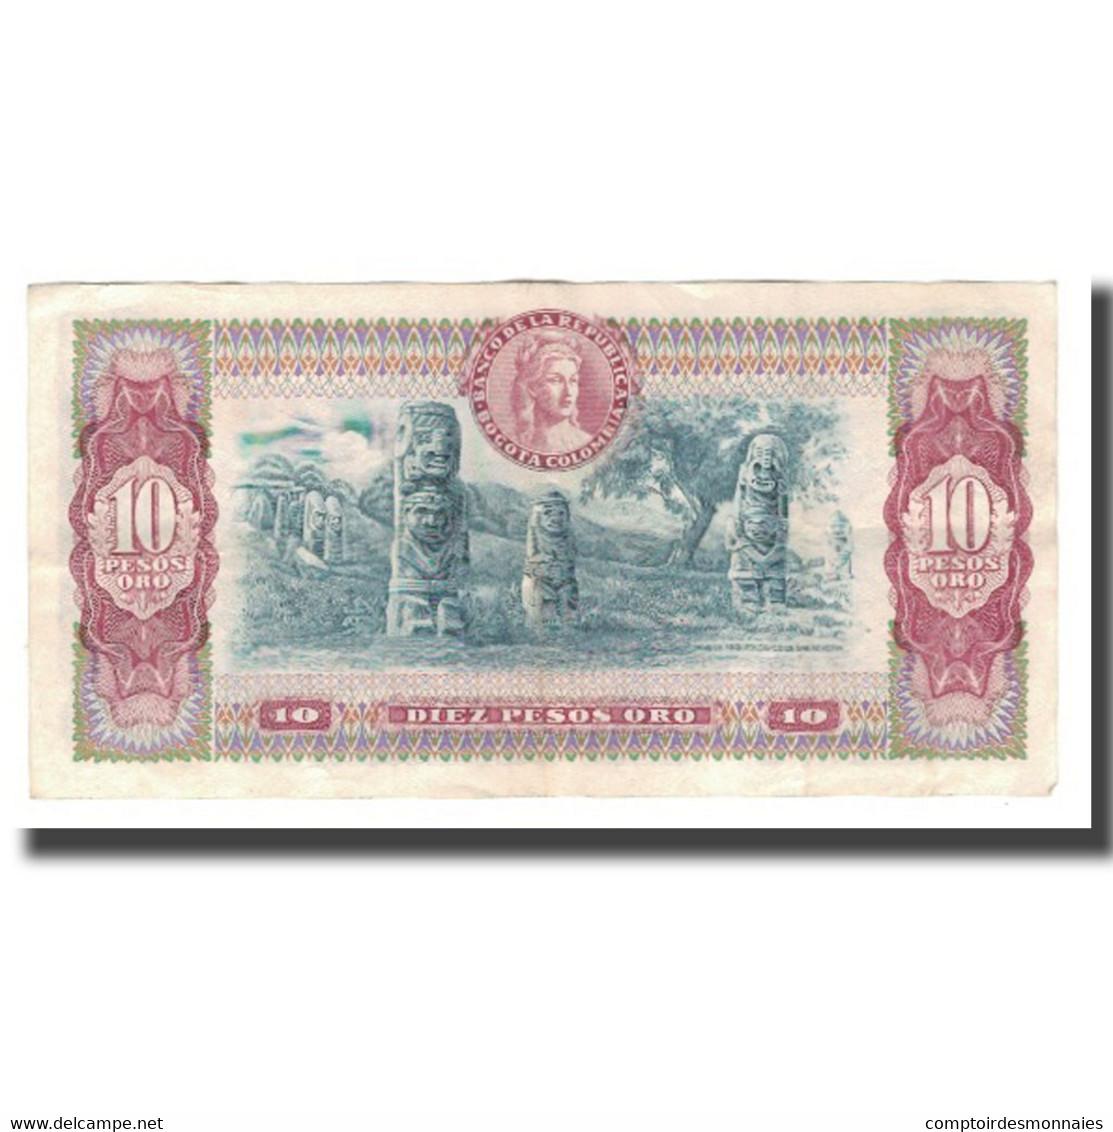 Billet, Colombie, 10 Pesos Oro, 1976, 1976-07-20, KM:407f, SPL - Colombia